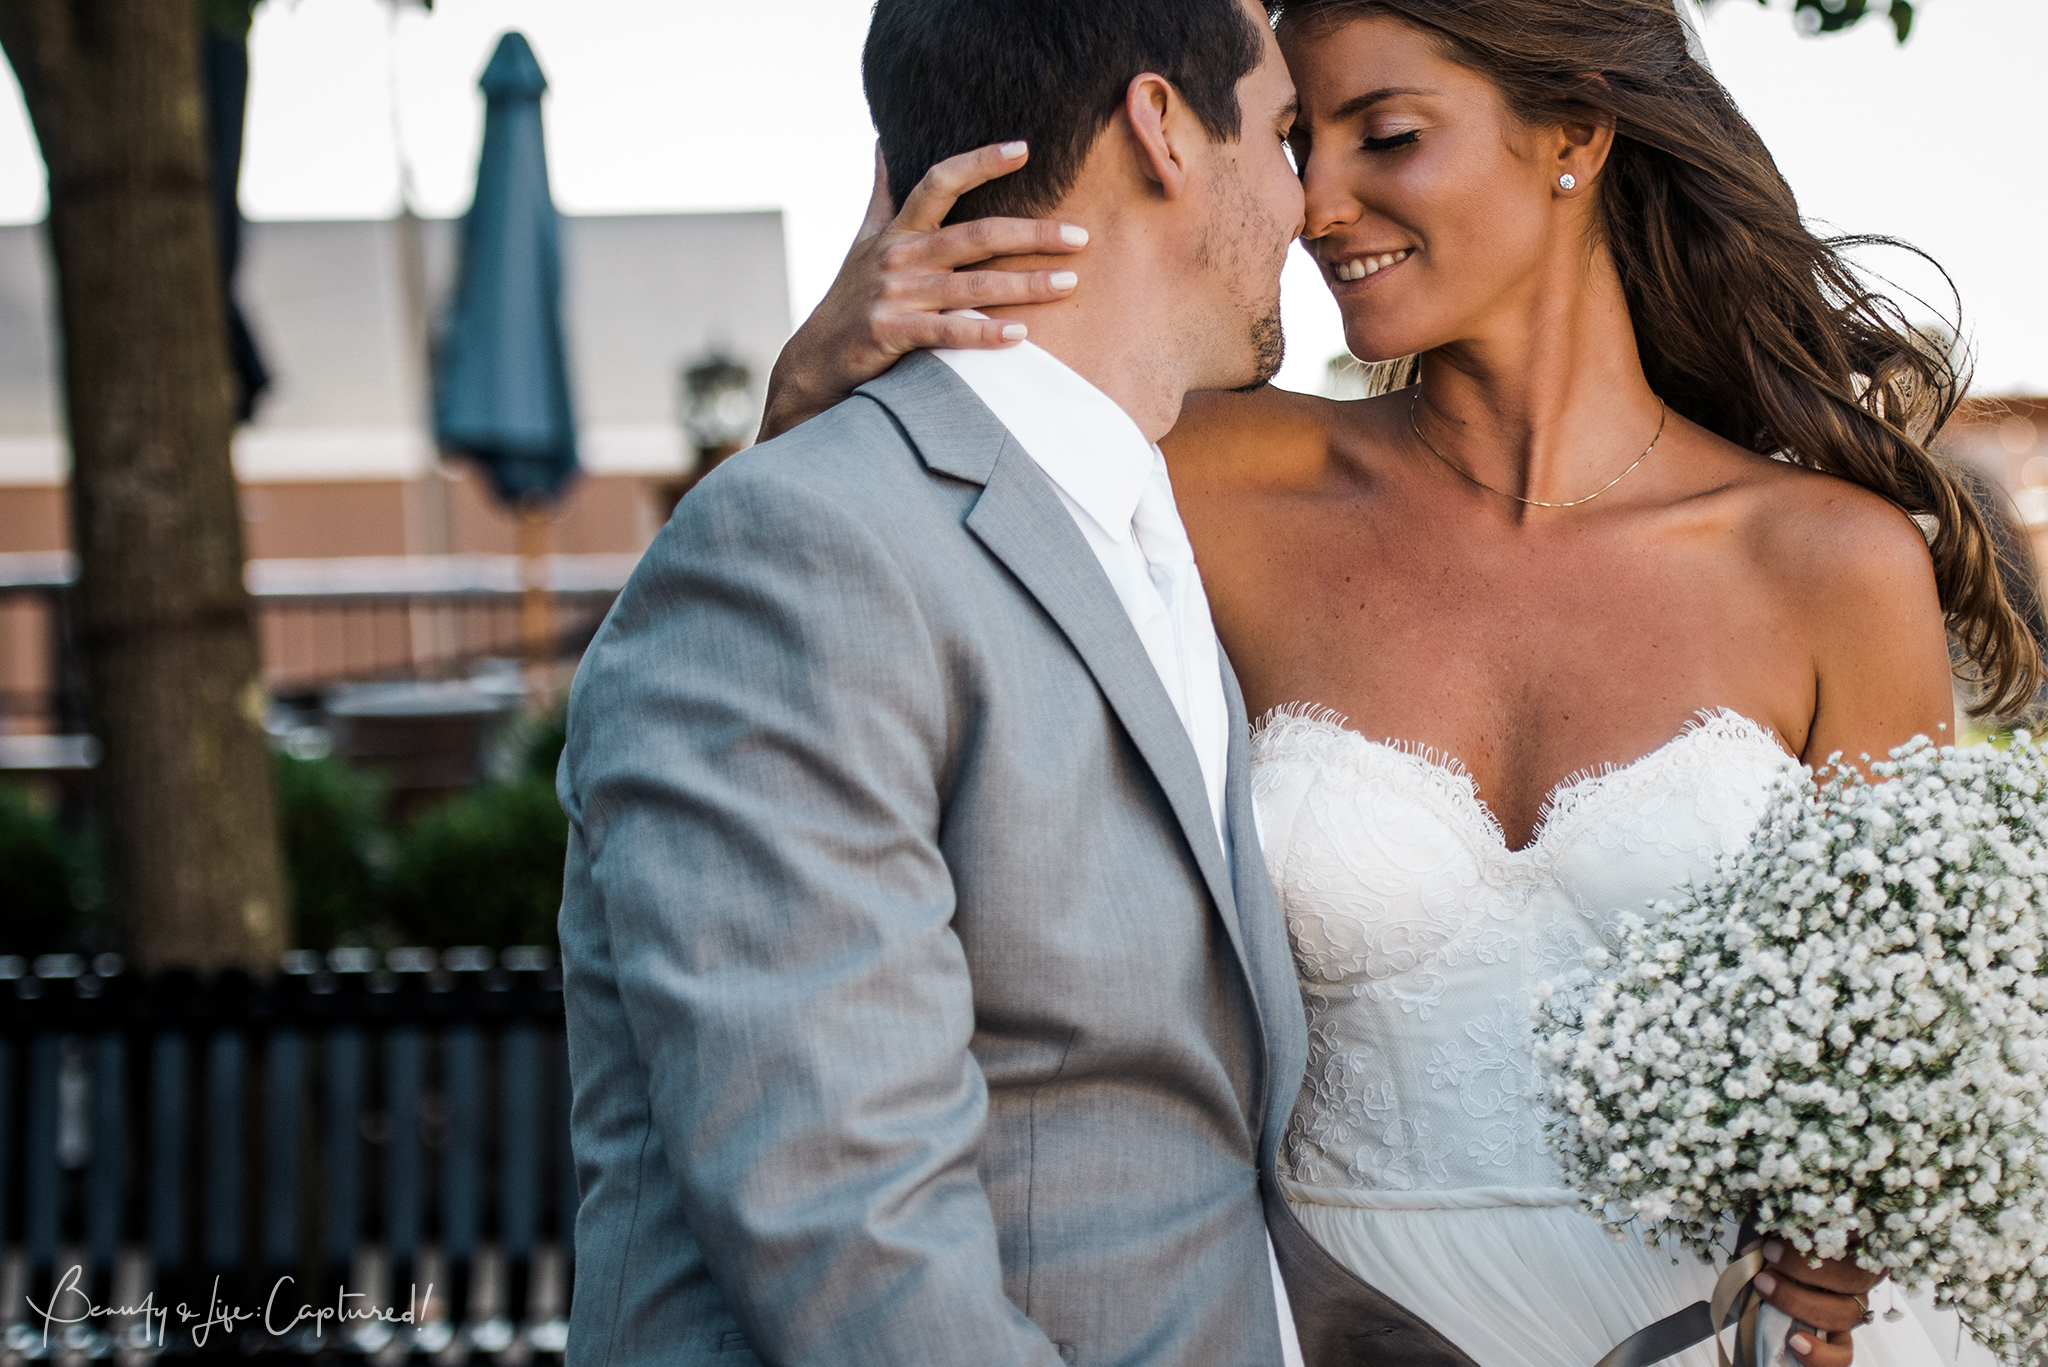 Beauty_and_Life_Captured_Athena_Wedding-3.jpg